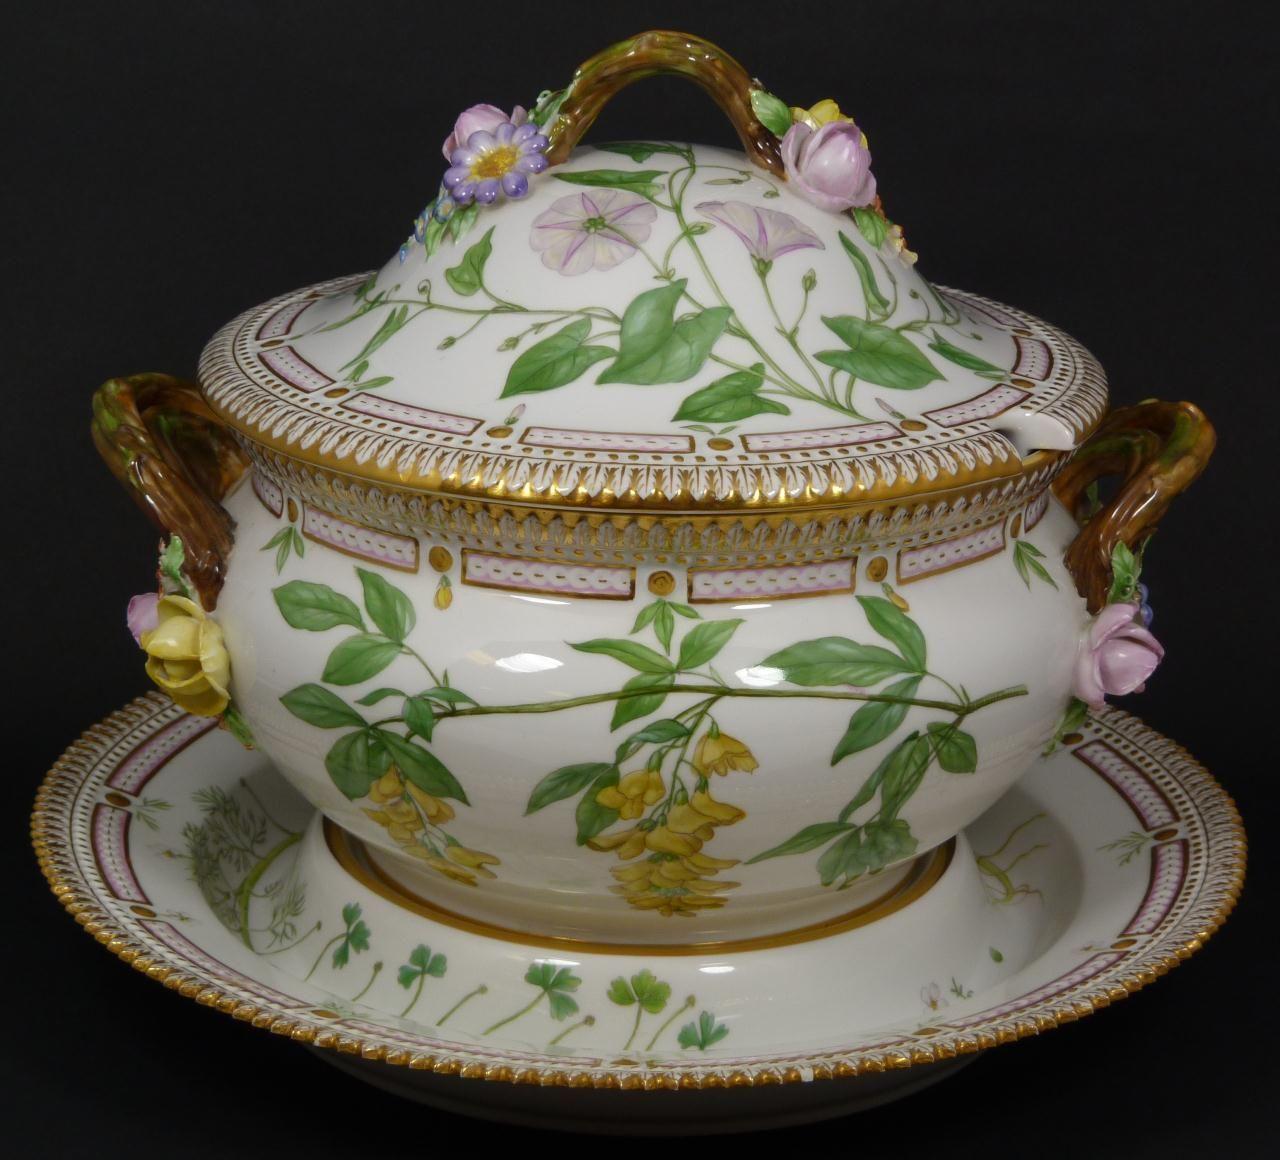 royal copenhagen flora danica royal copenhagen danica pinterest porzellan geschirr und. Black Bedroom Furniture Sets. Home Design Ideas